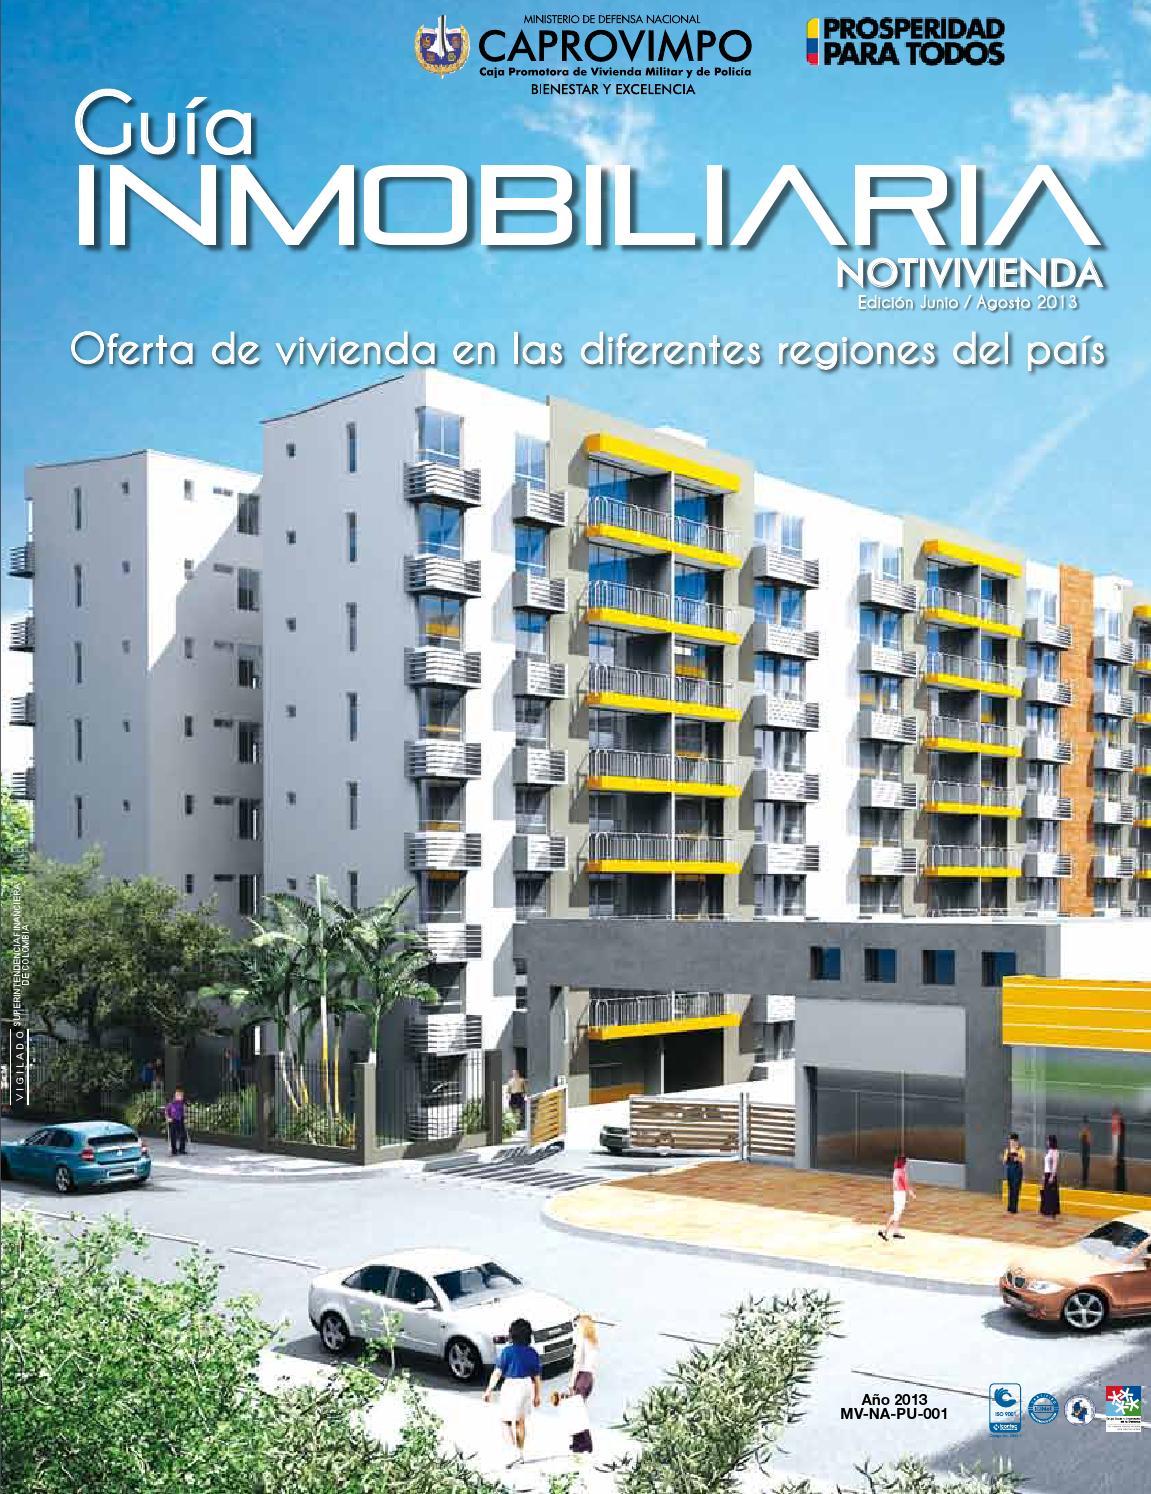 Guia inmobiliaria caprovimpo by caja honor issuu for Guia inmobiliaria